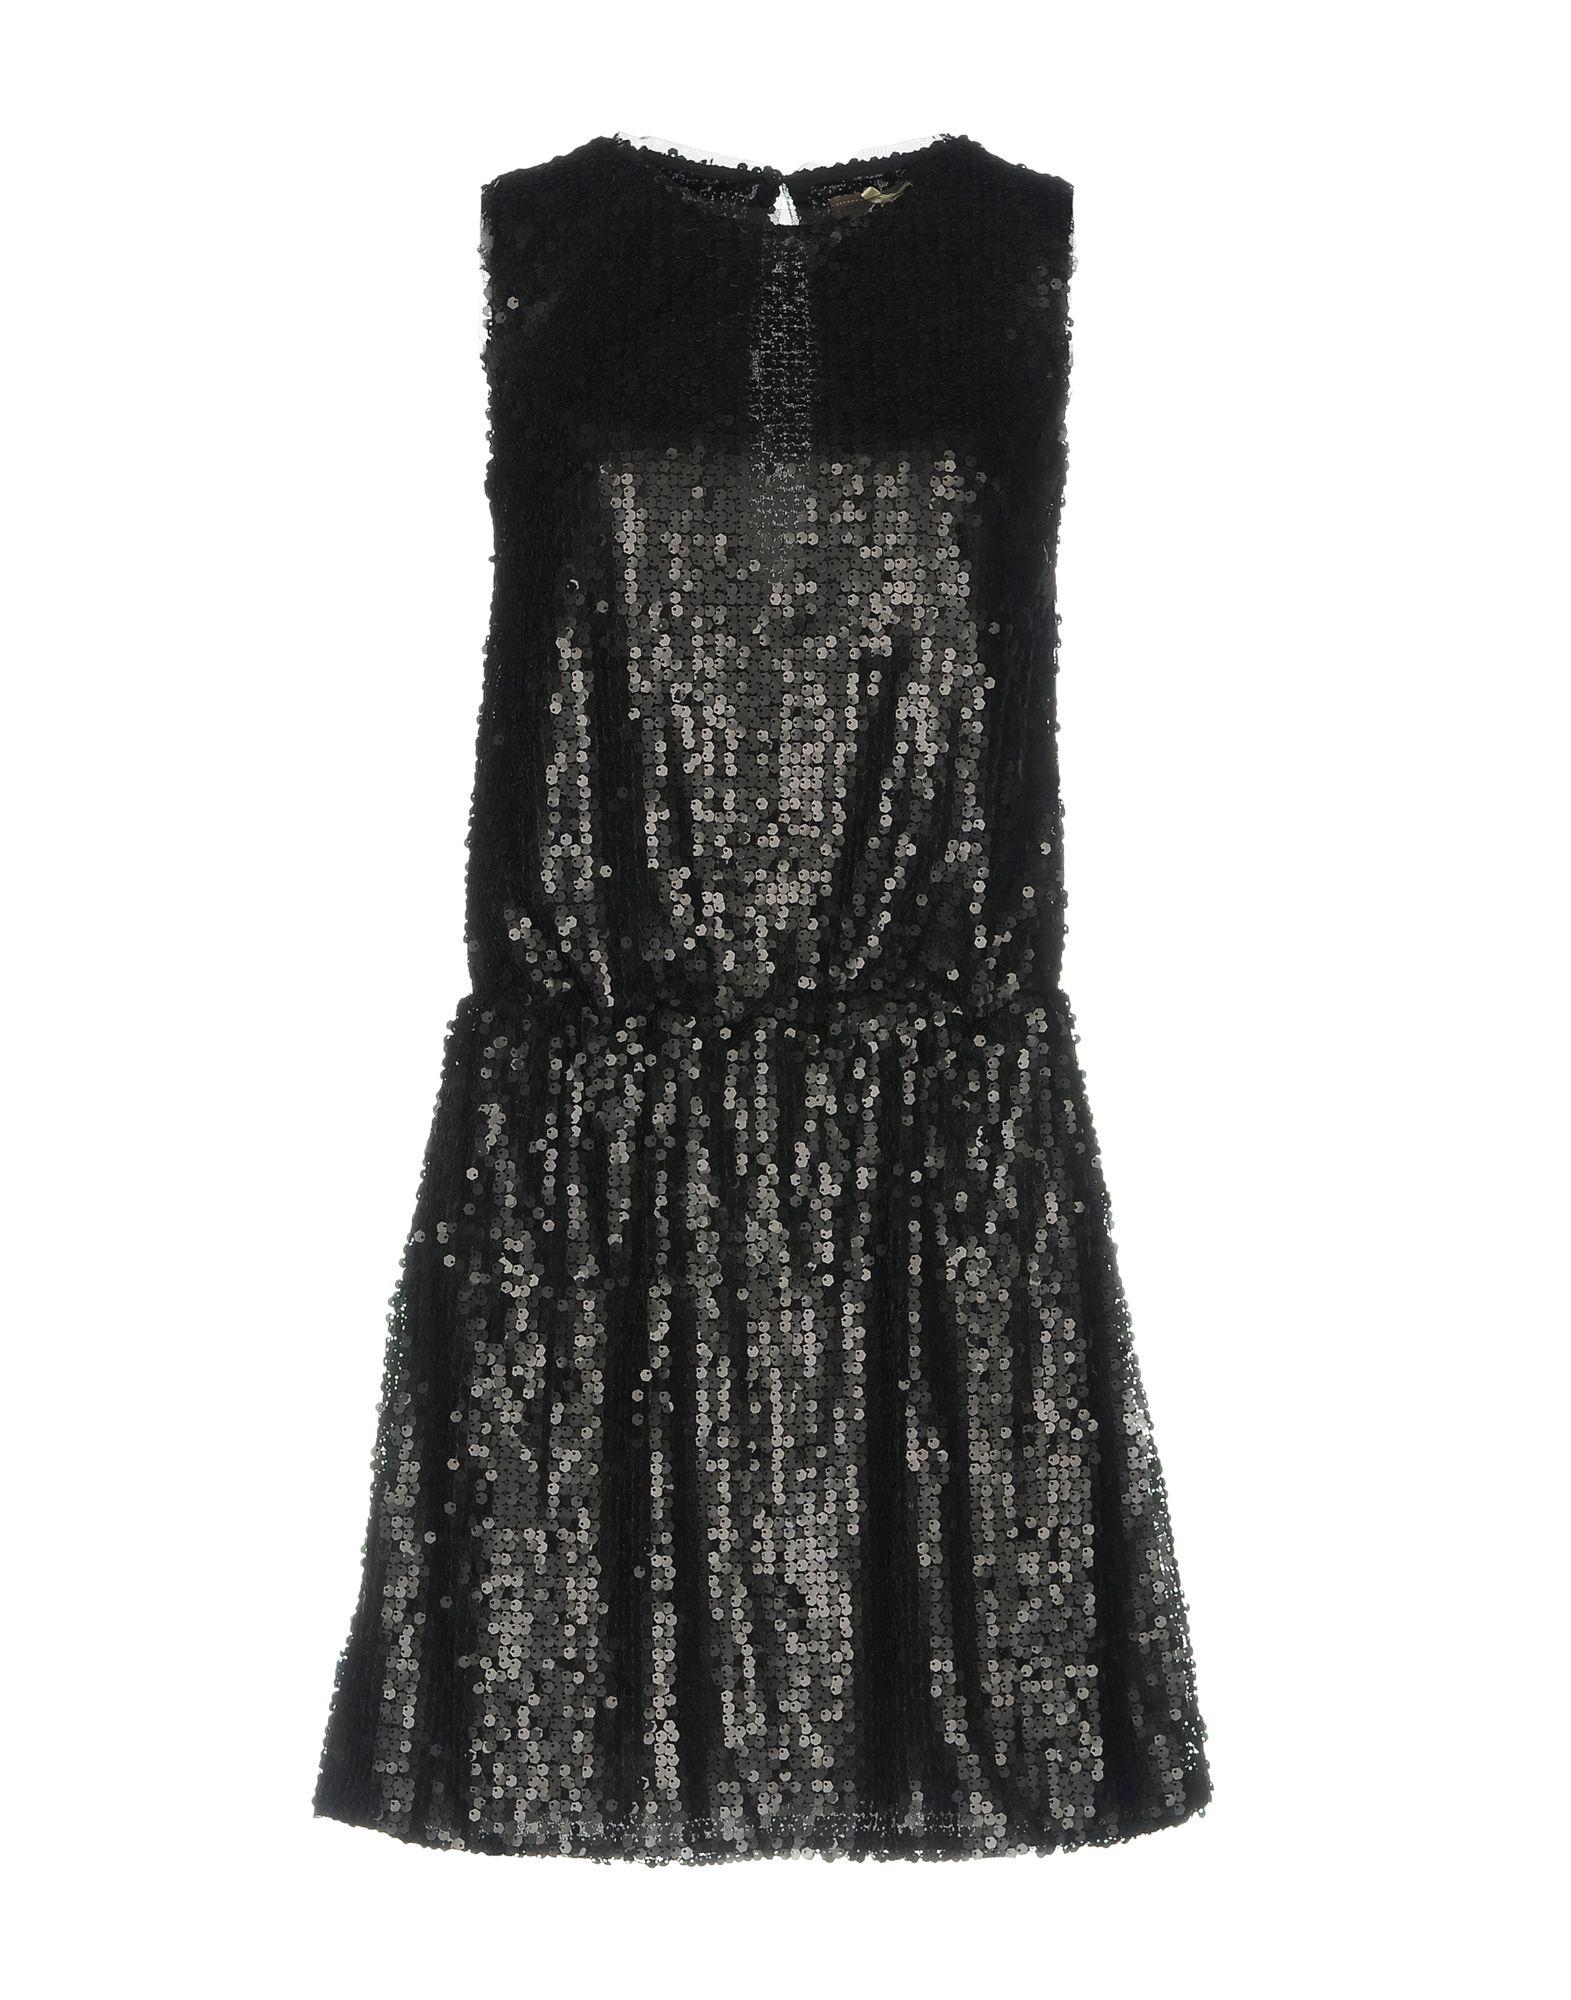 ATELIER FIXDESIGN Короткое платье l atelier de la mode by patricia forgeal короткое платье